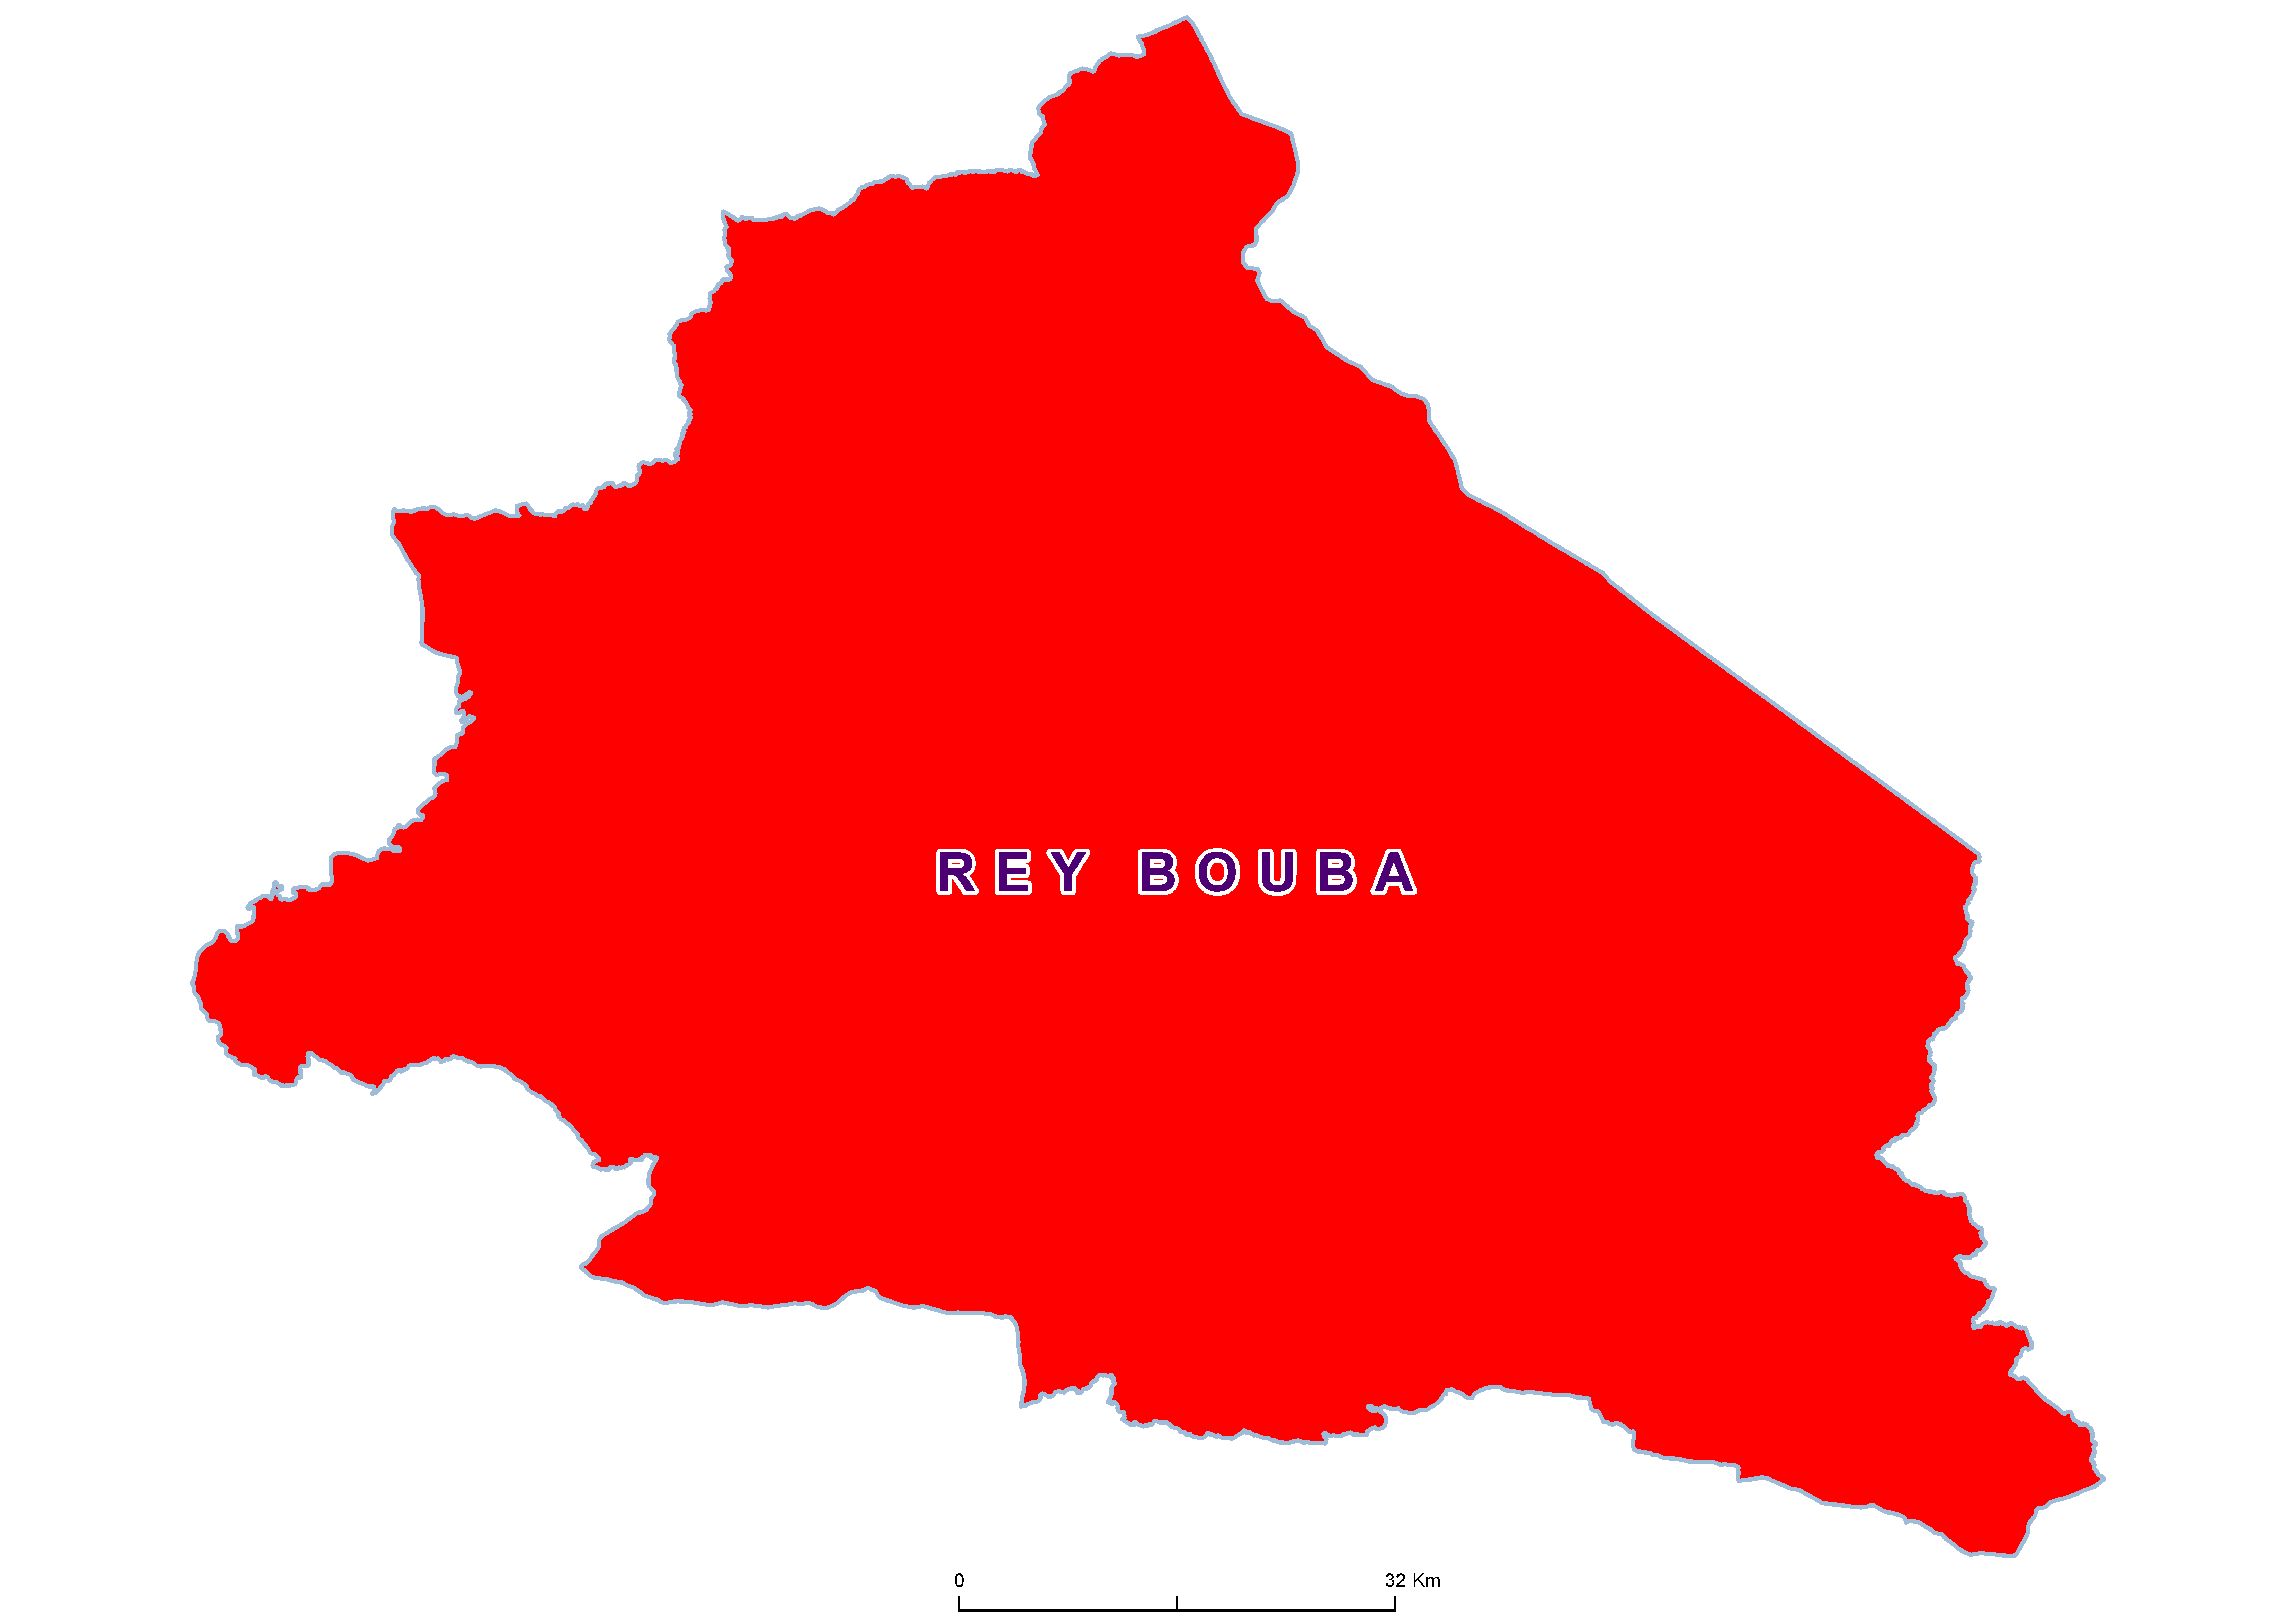 Rey bouba Max STH 19850001